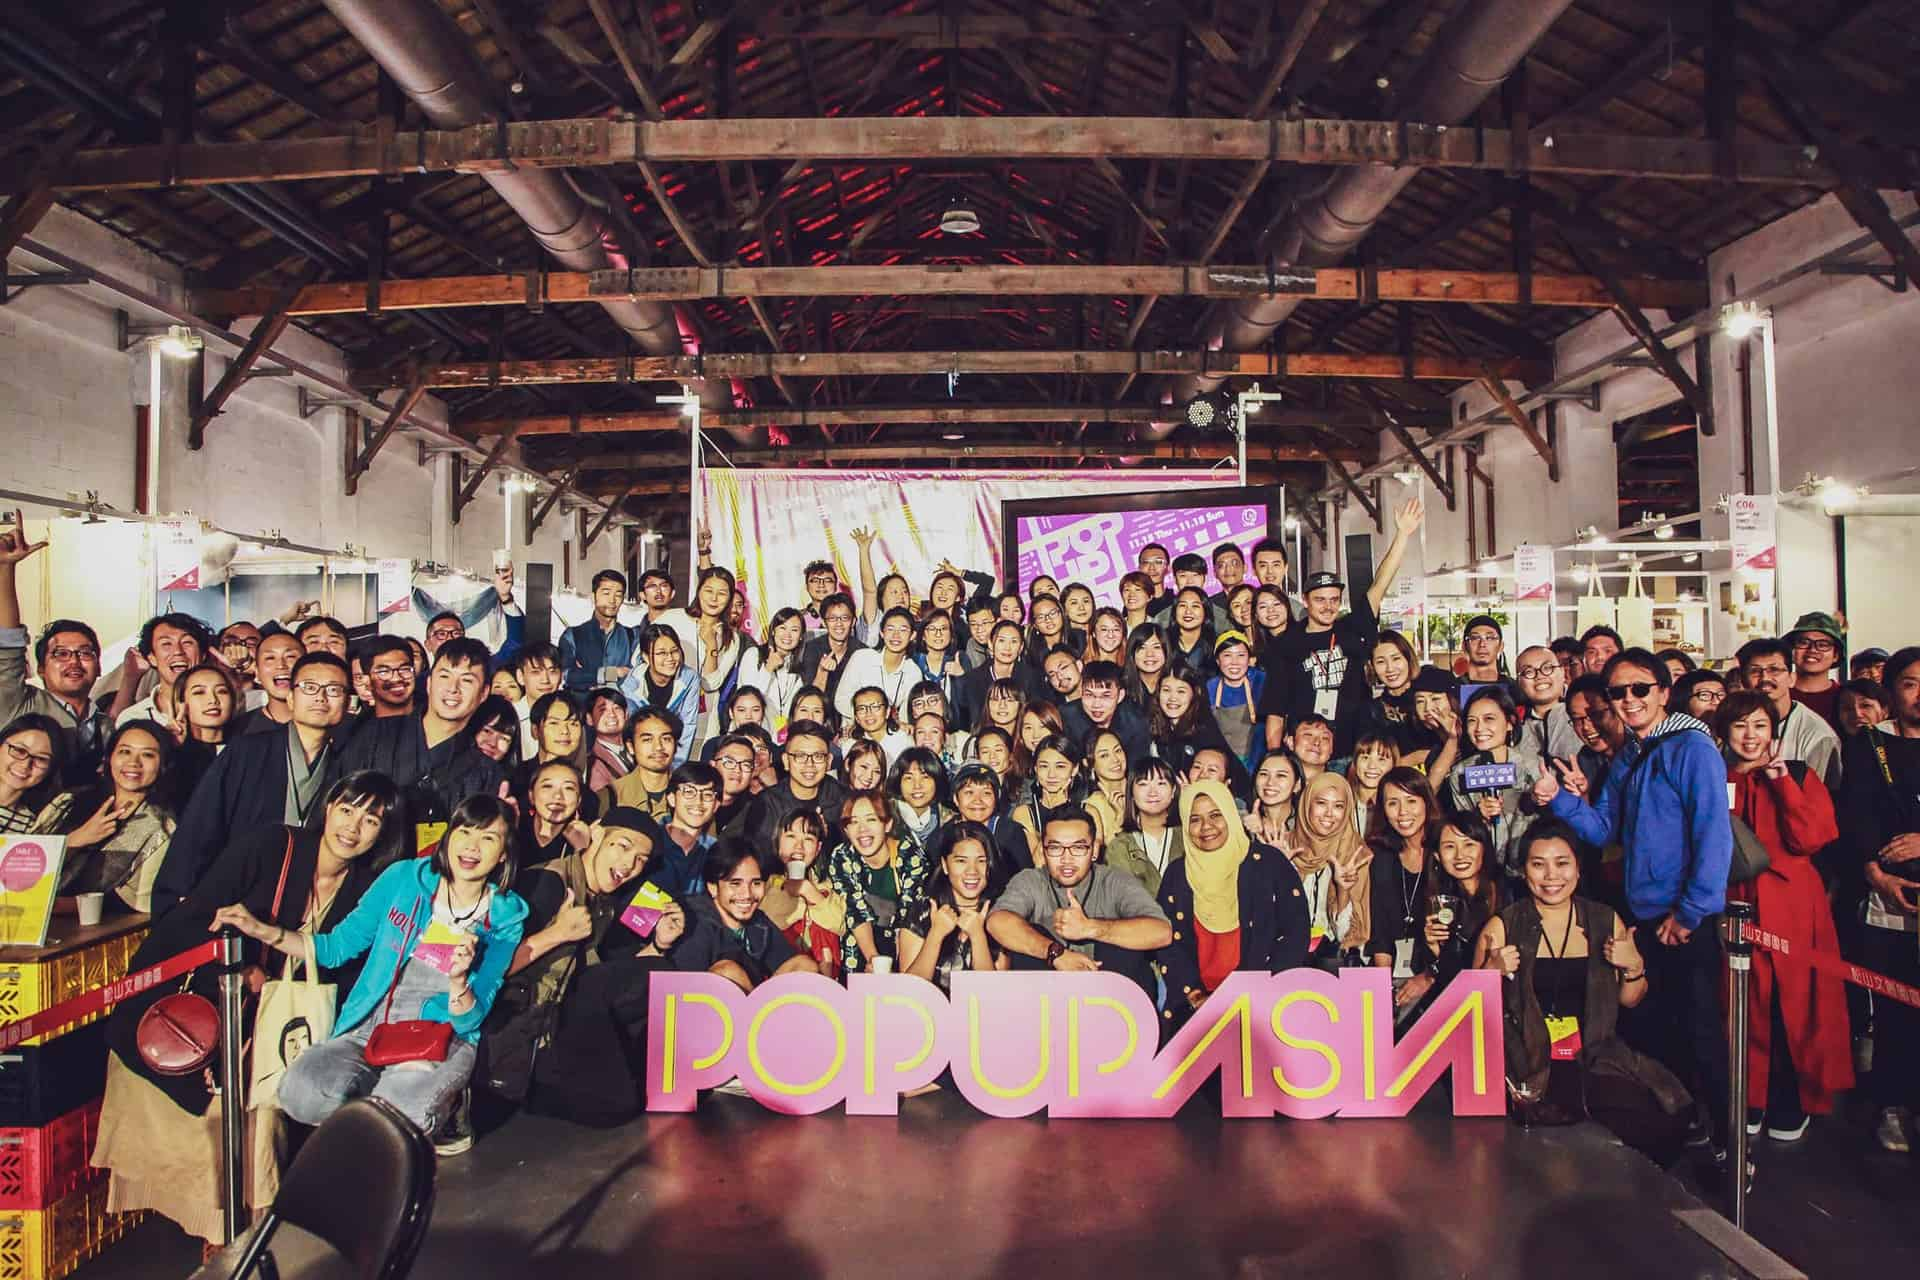 PopUpAsia手創展團體照